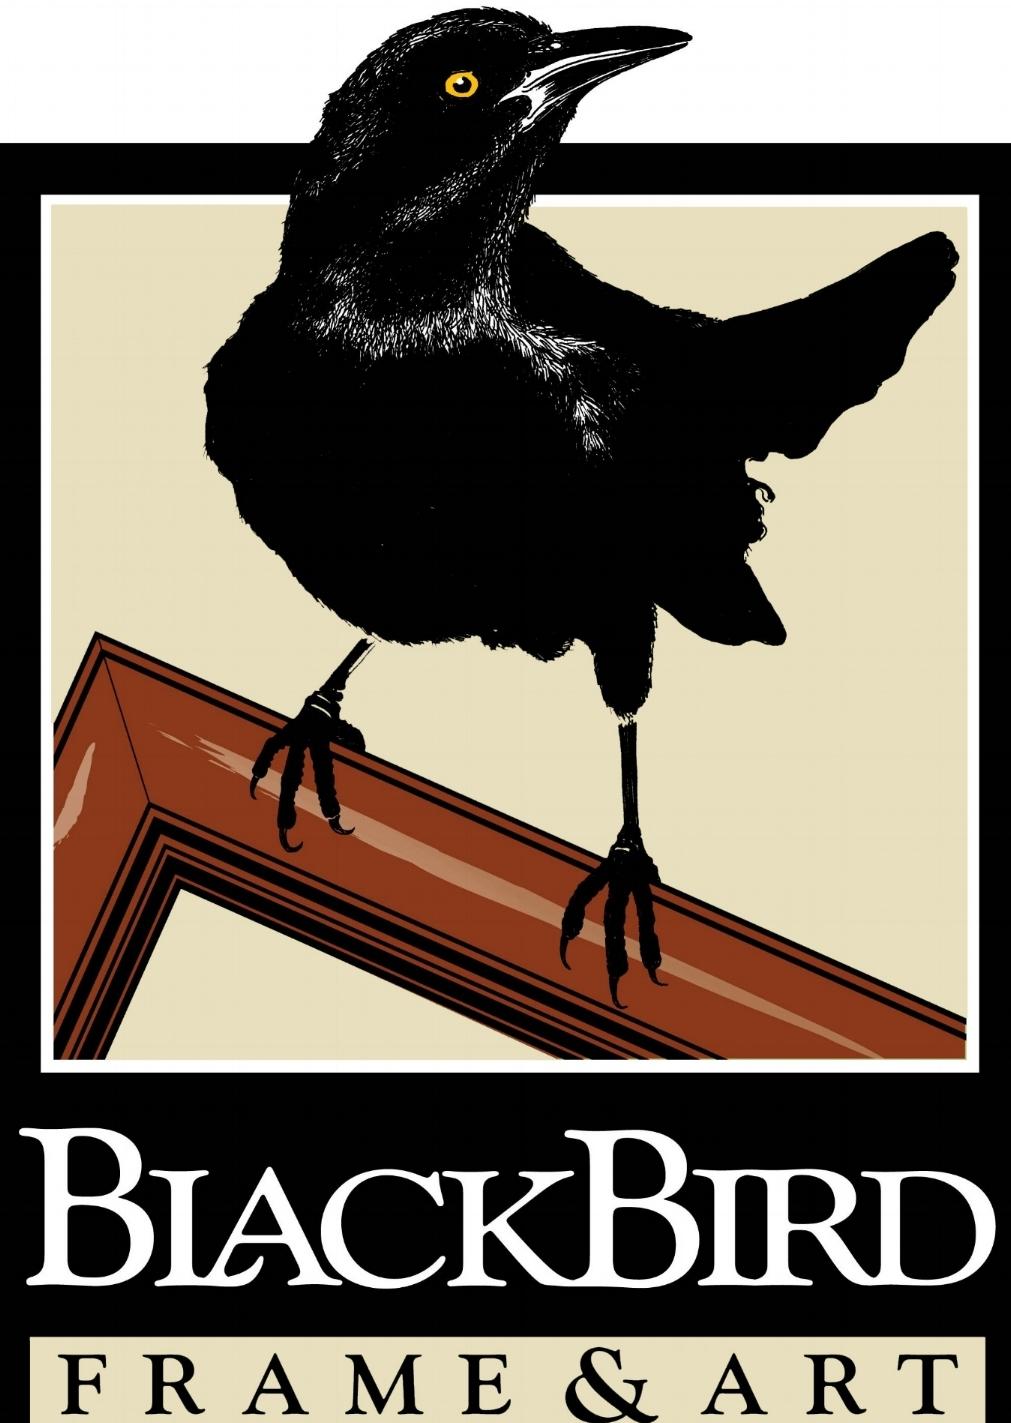 blkbird sign_Beige.jpg